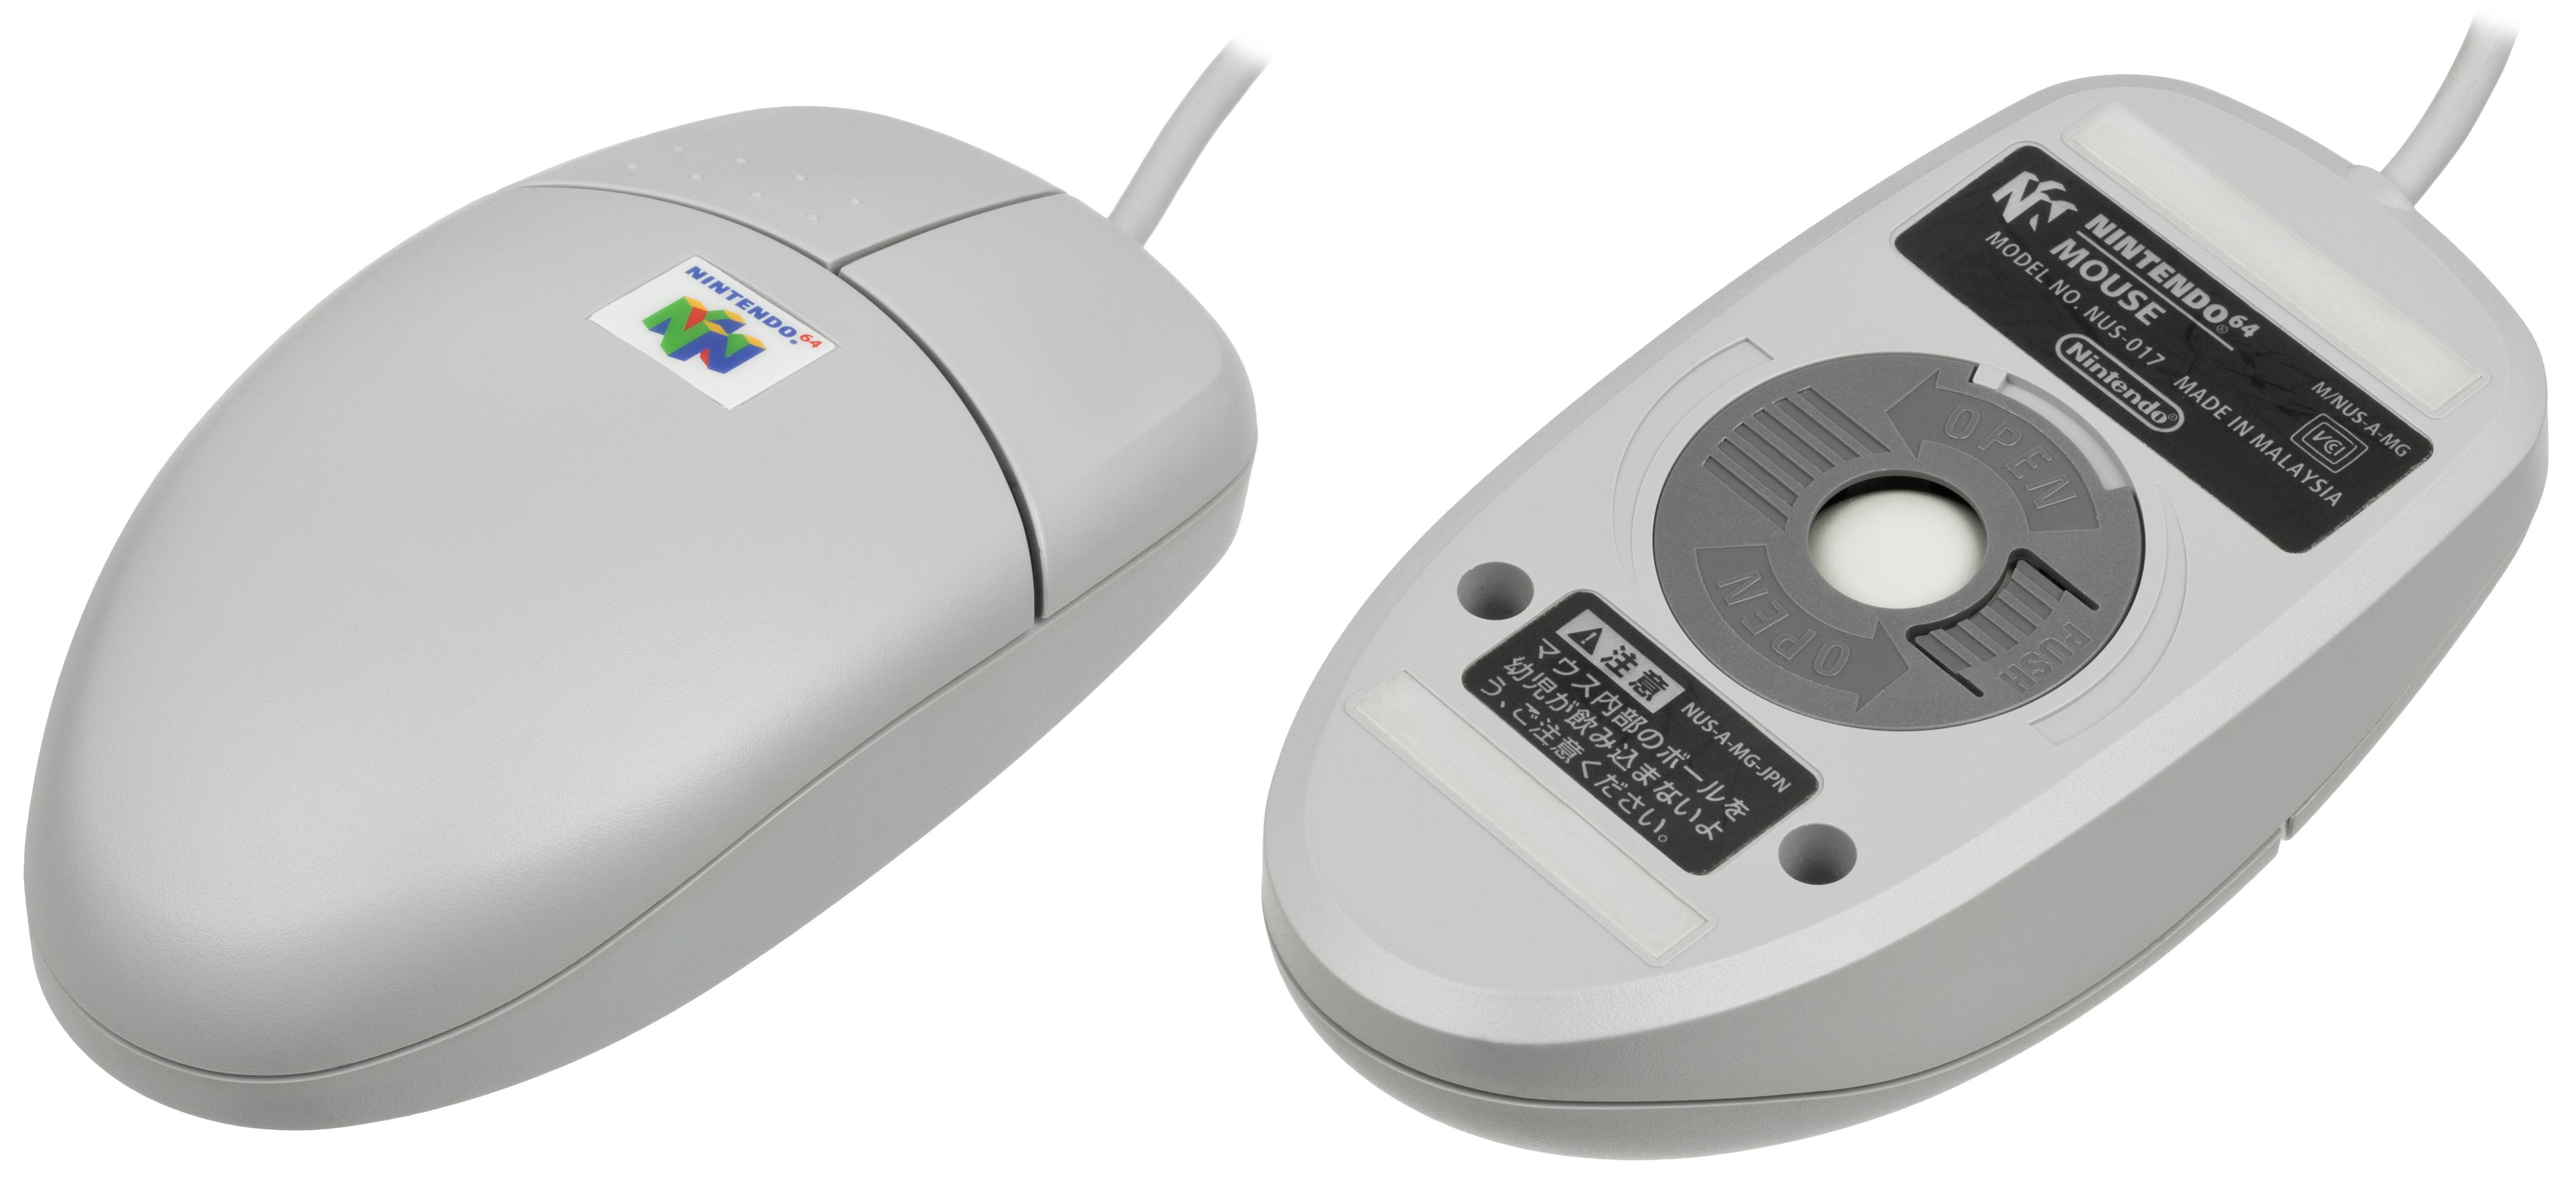 File:Nintendo-64-Mouse jpg - Wikimedia Commons